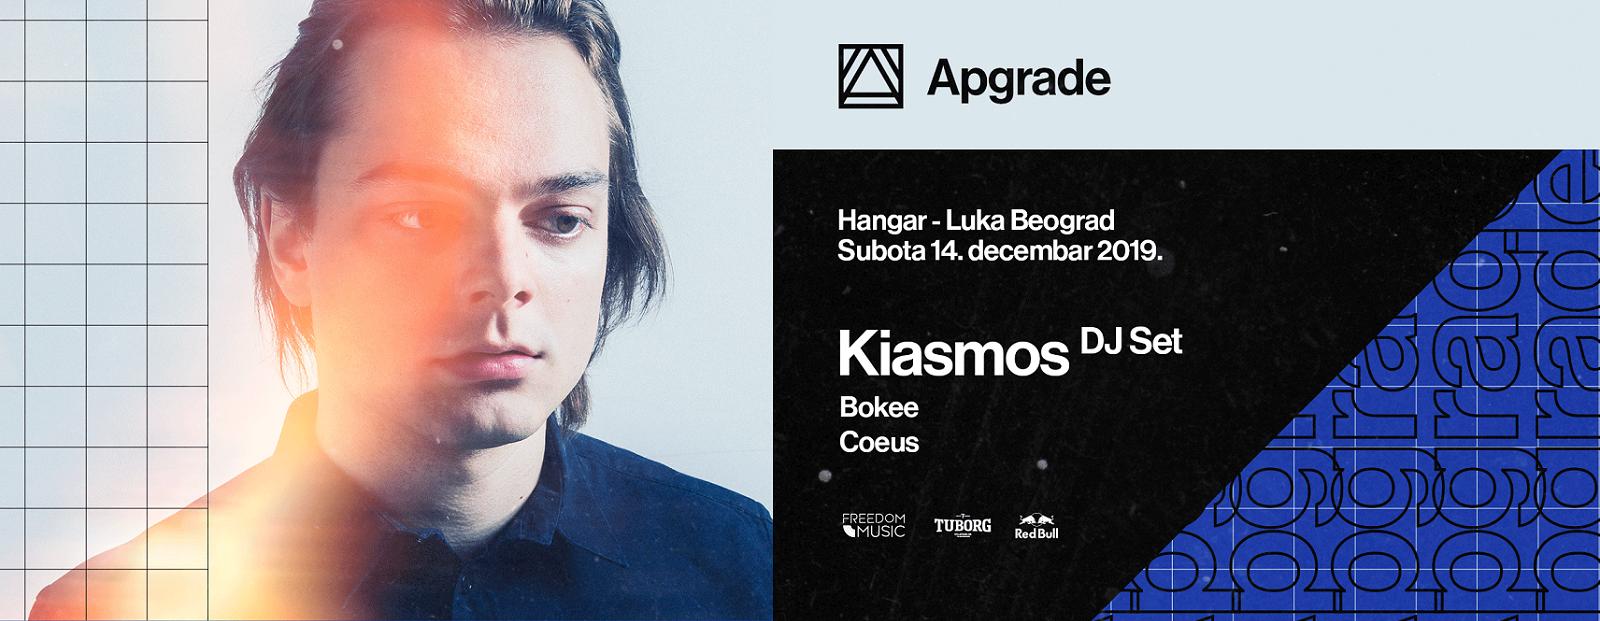 Kiasmos prvi put u Beogradu!